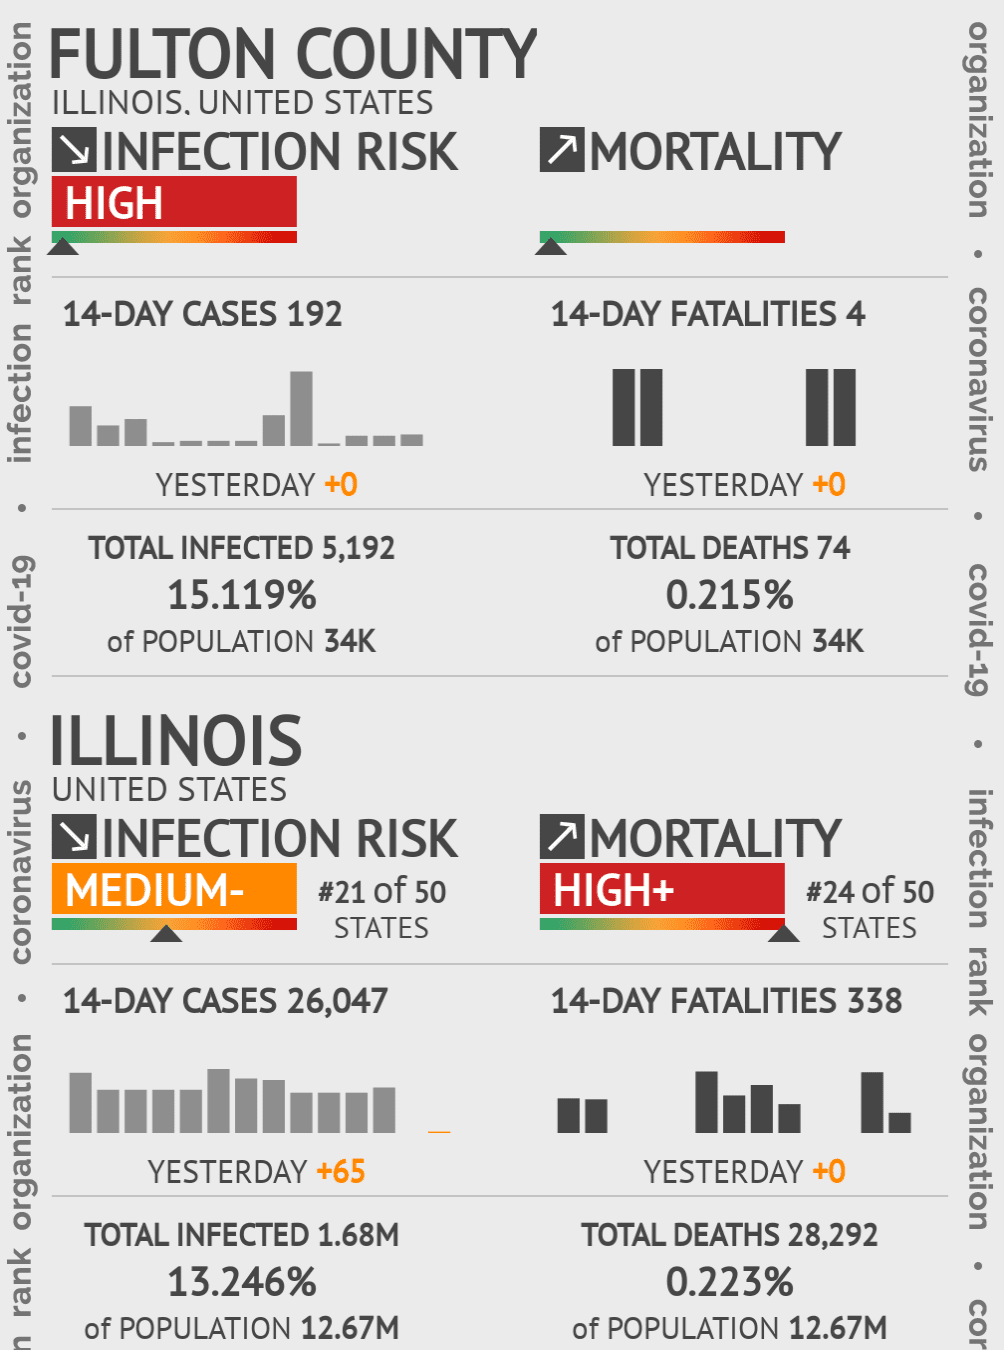 Fulton County Coronavirus Covid-19 Risk of Infection on October 30, 2020